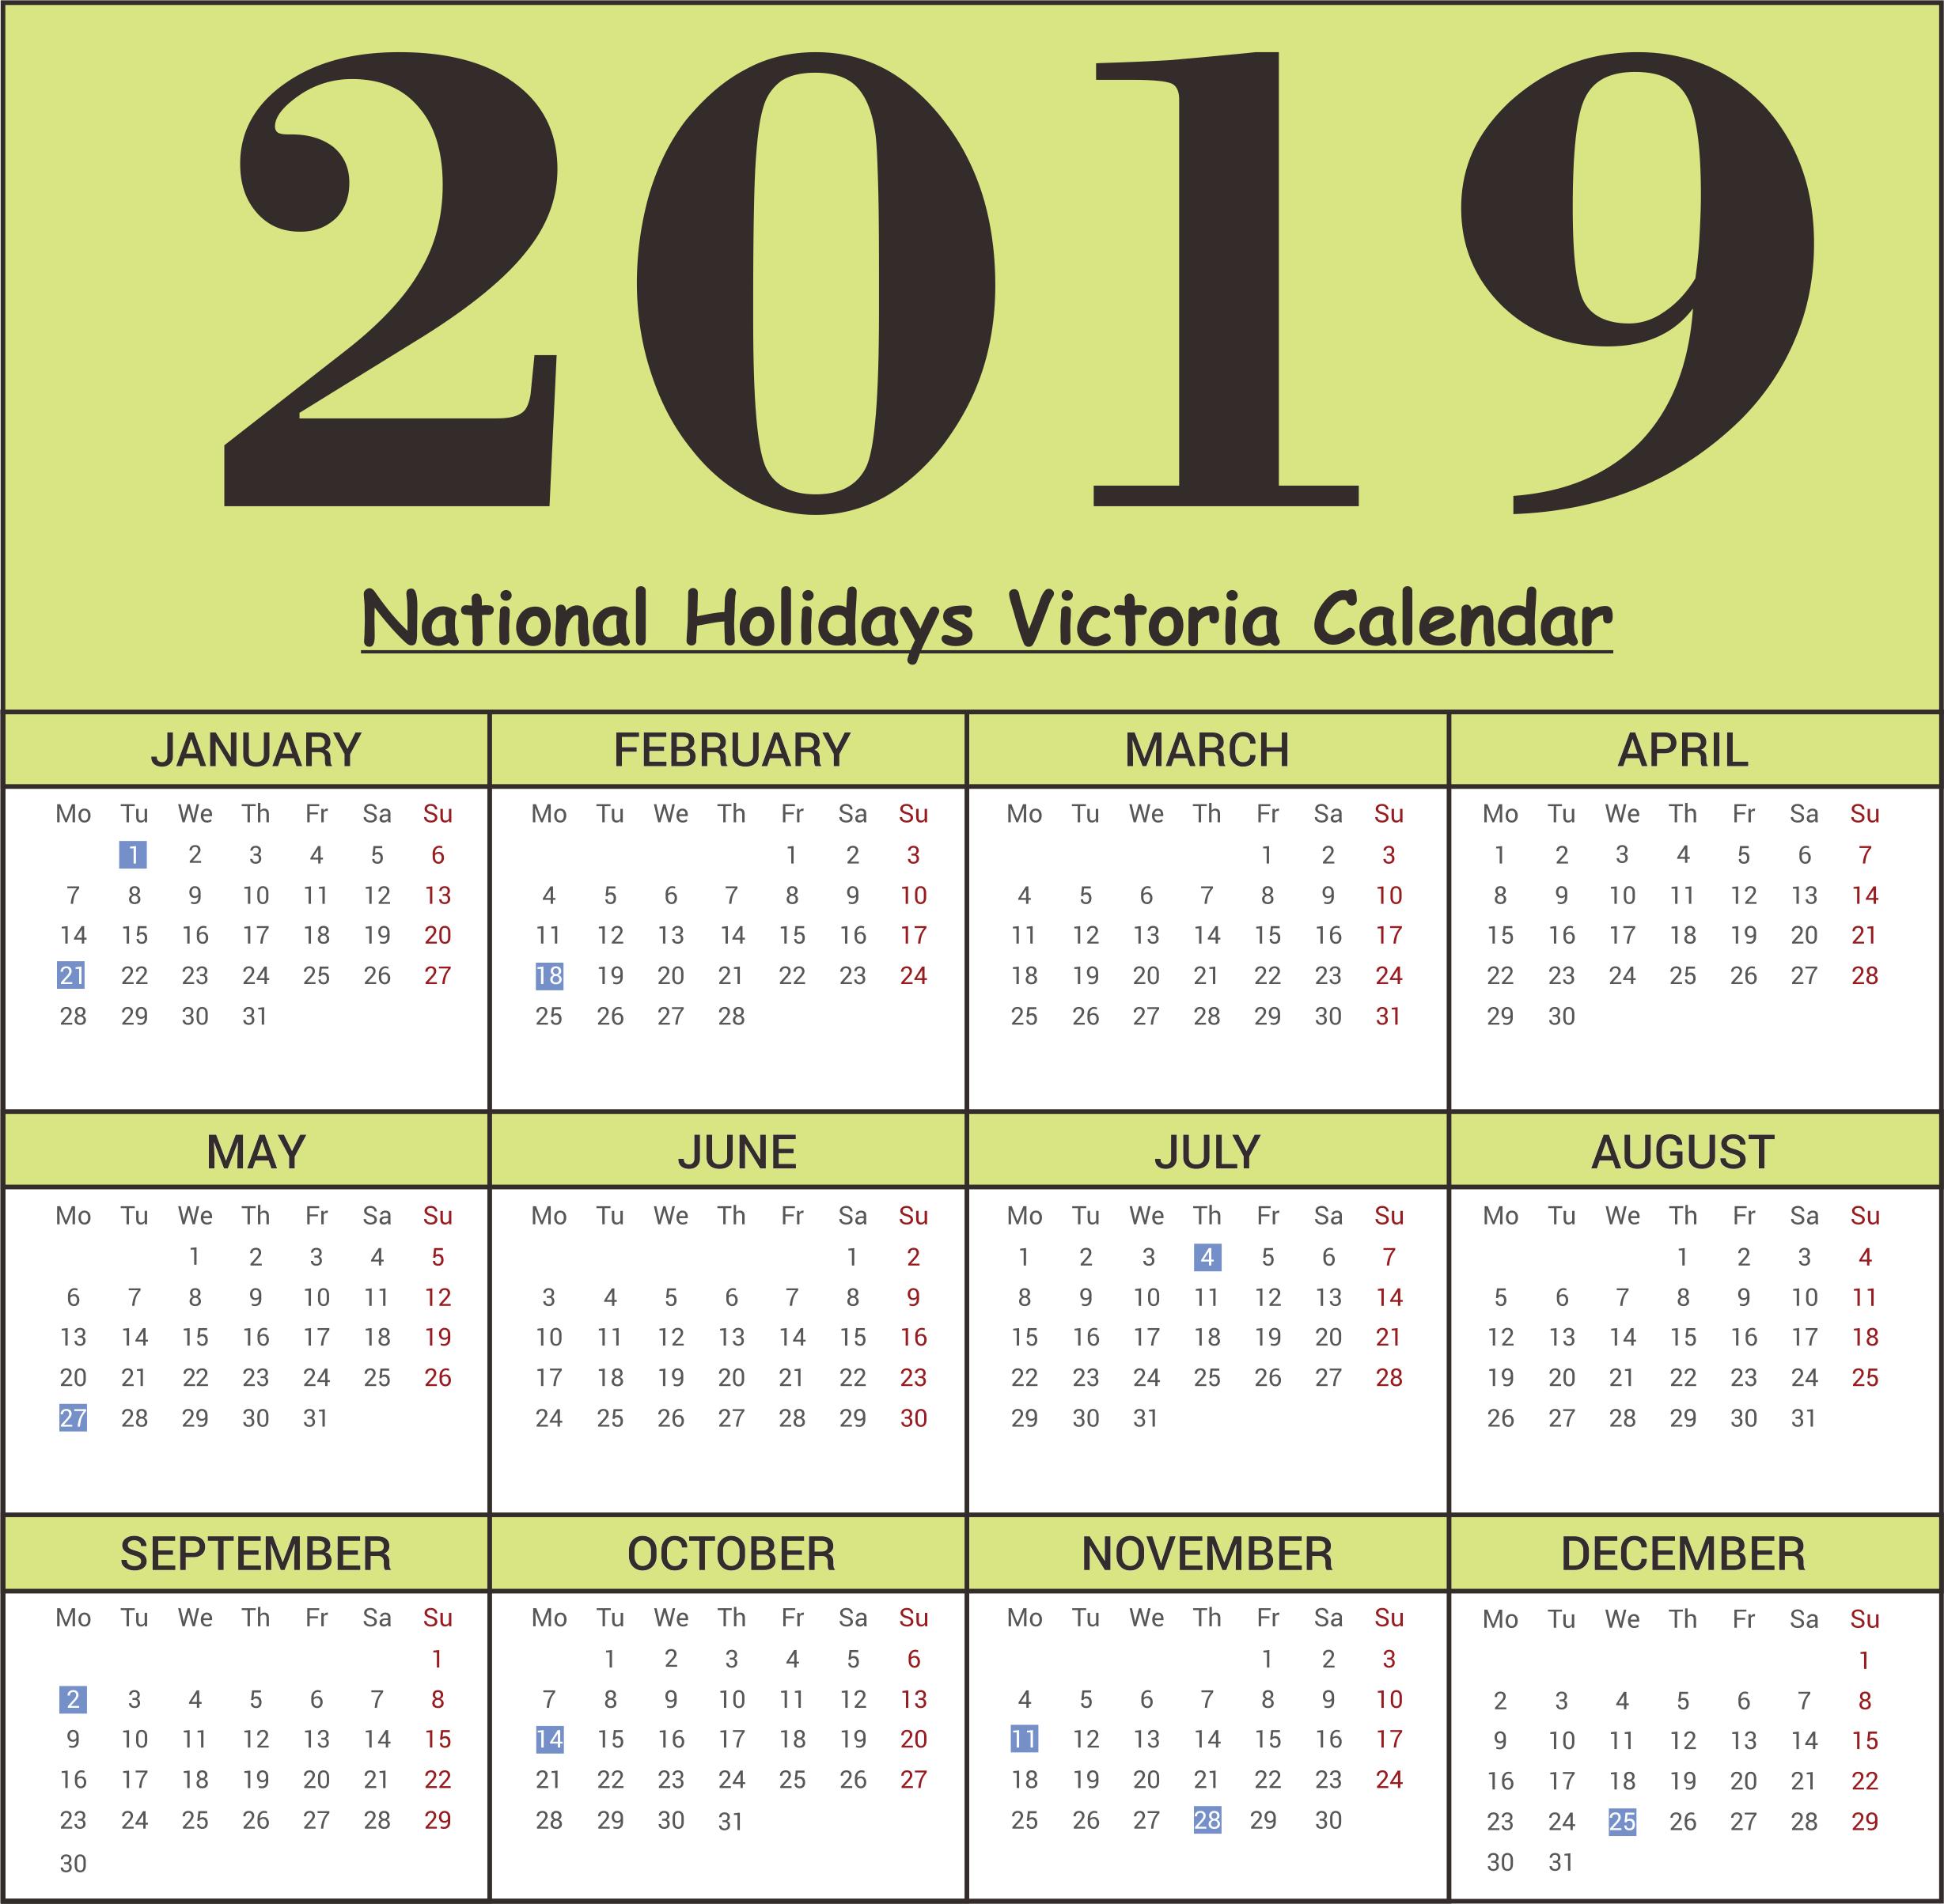 Free Victoria National Holidays 2019 Calendar Templates | Free Calendar 2019 Victoria